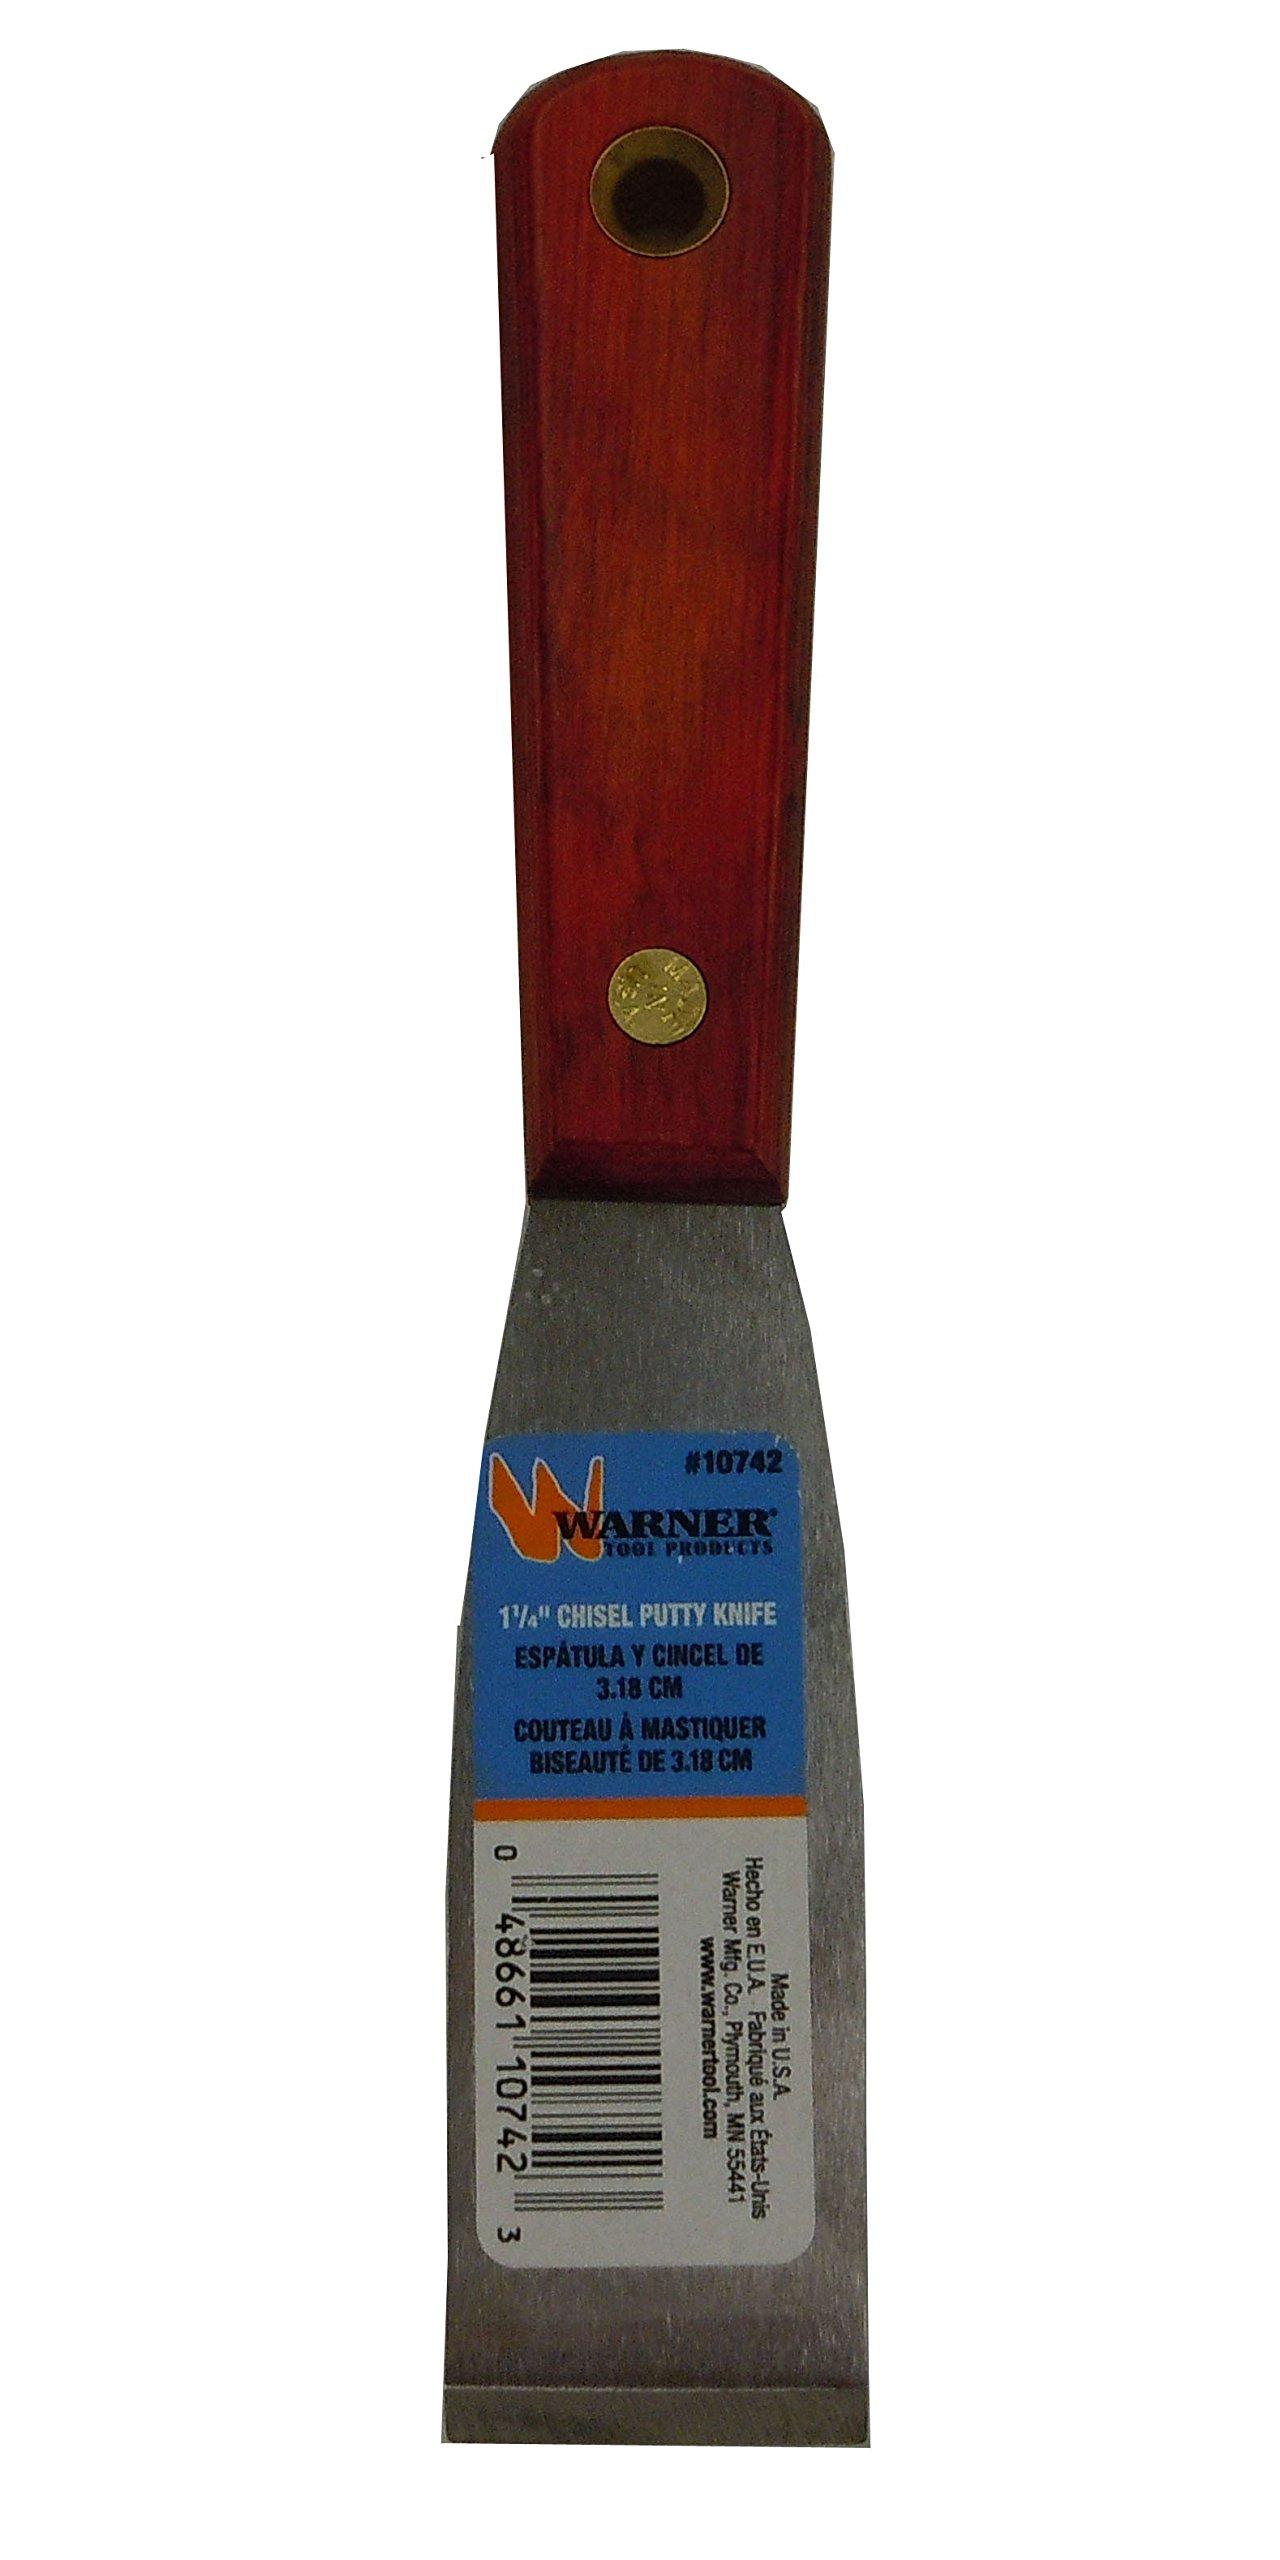 Warner 1-1/4'' Chisel Ground Stiff Putty Knife, Stainless Steel Blade, Rosewood Series, 10742